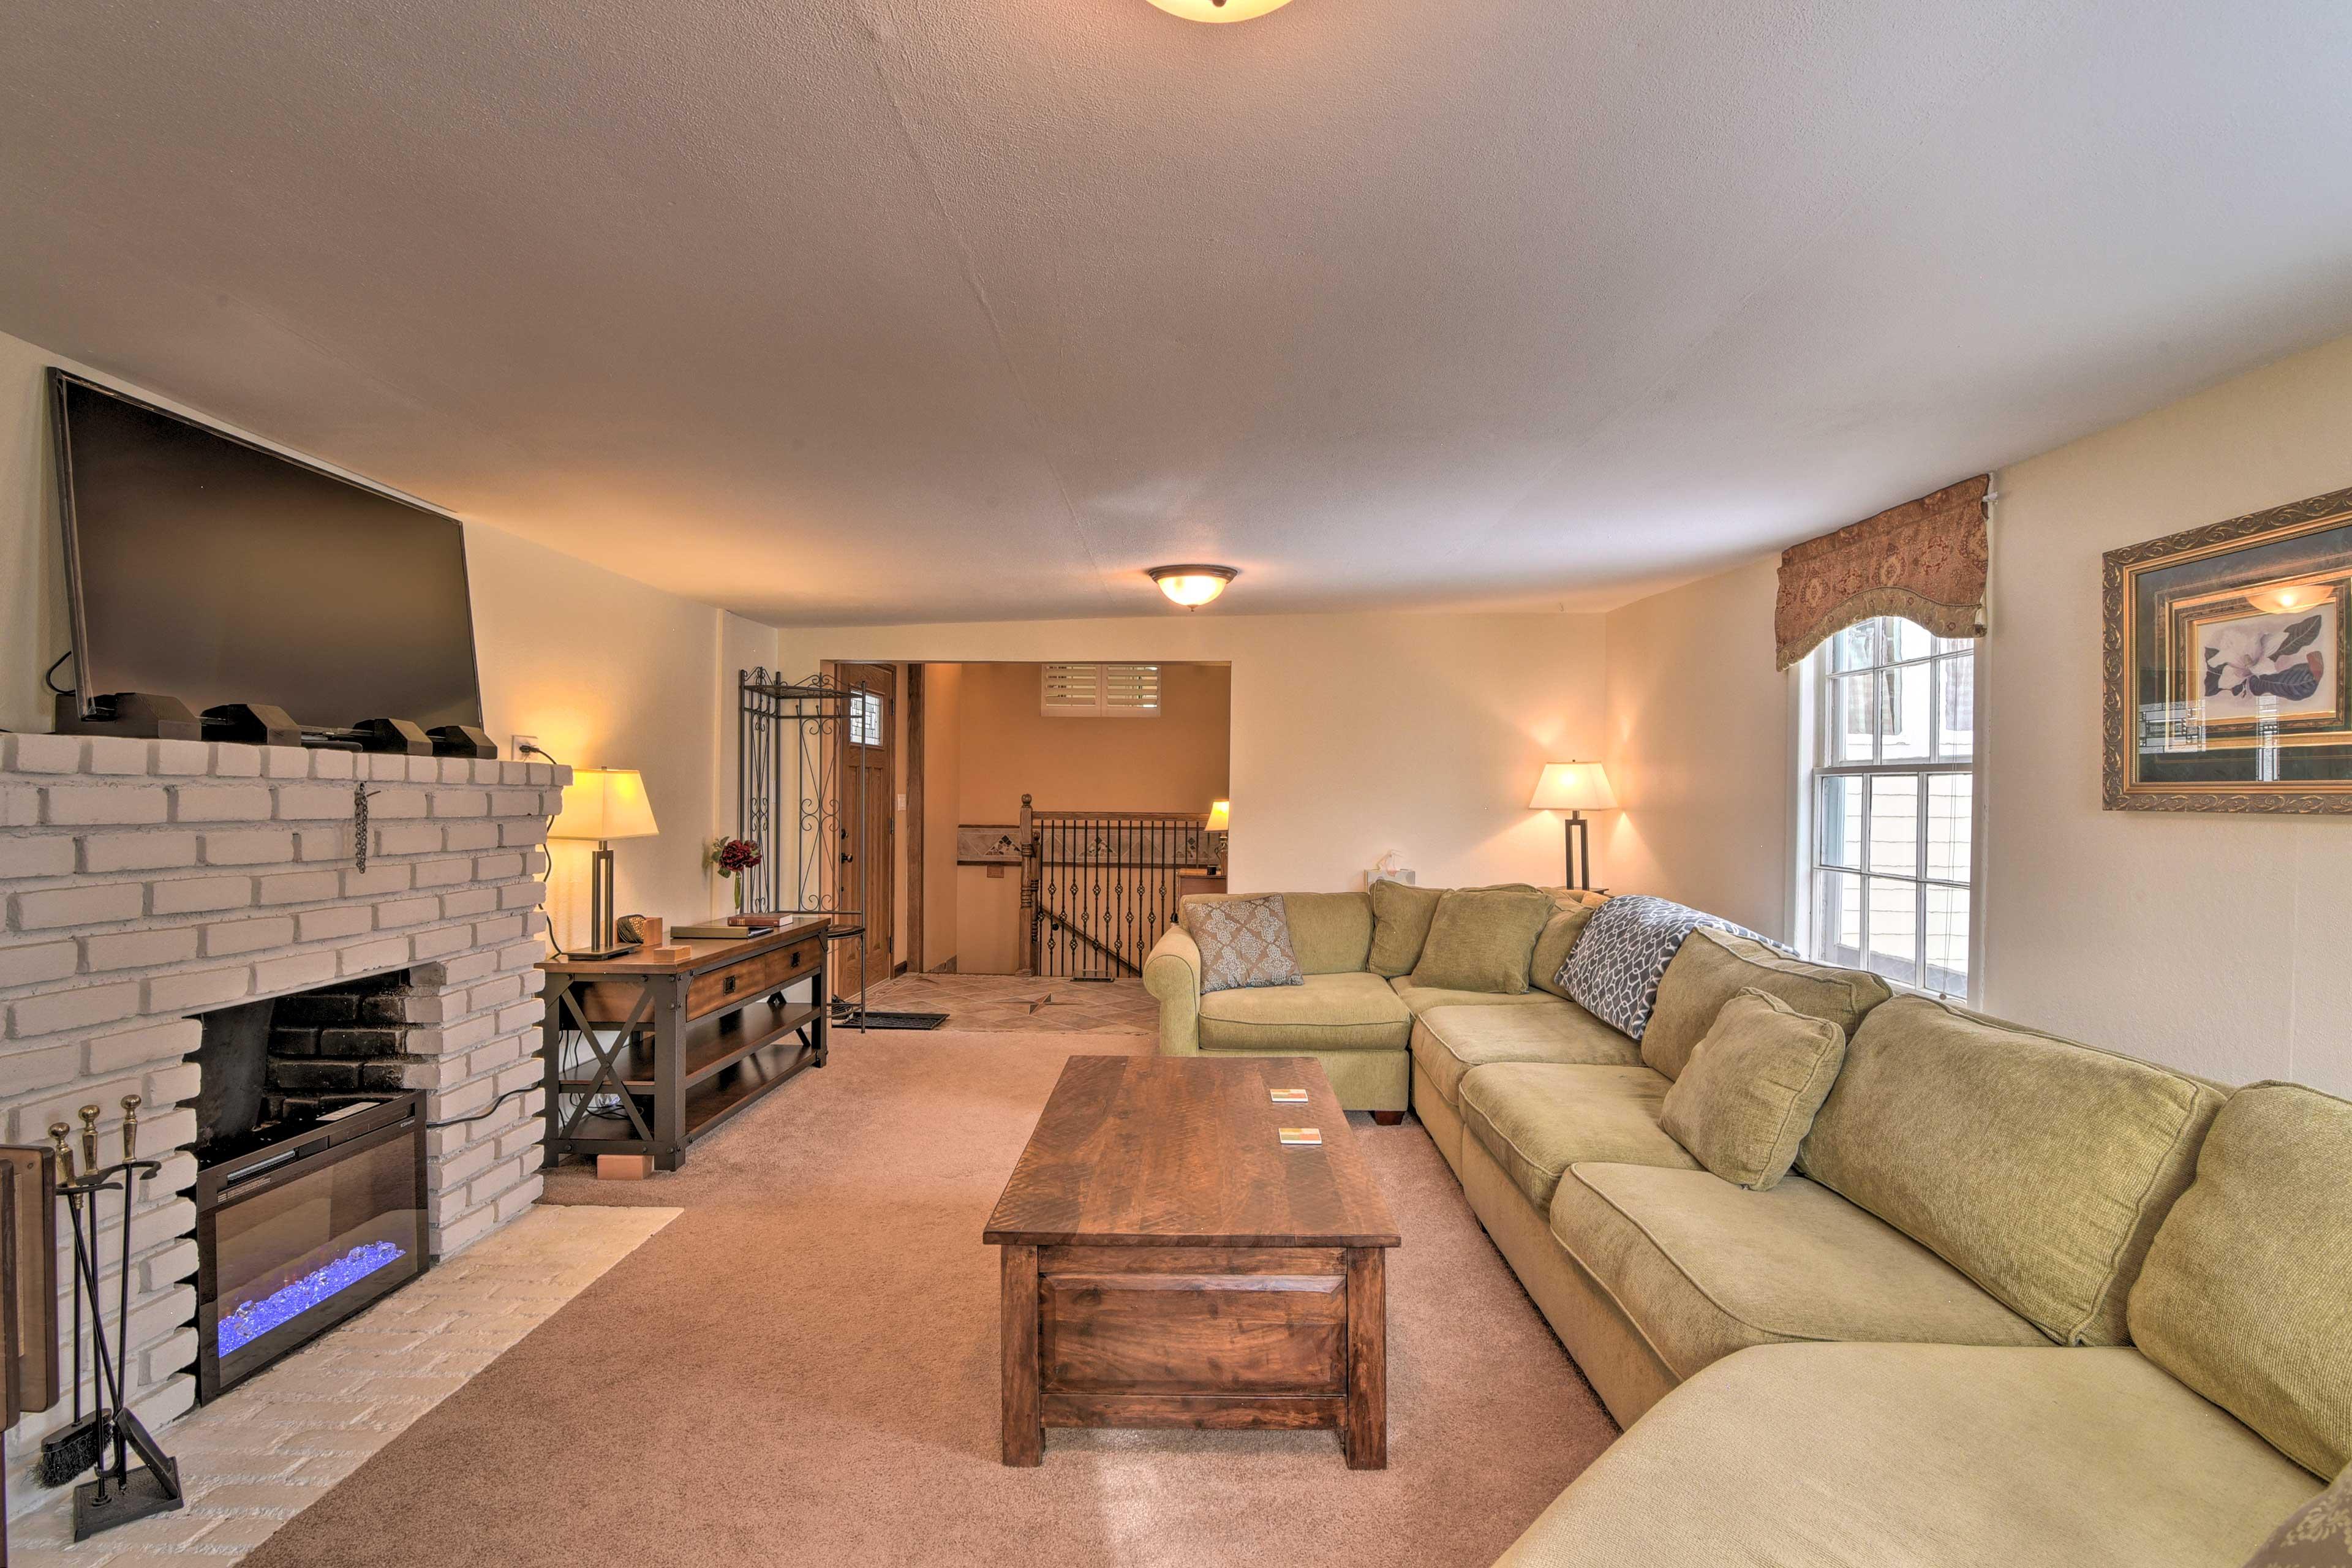 Unwind in this lavish 4-bedroom, 3-bath vacation rental home in Empire.